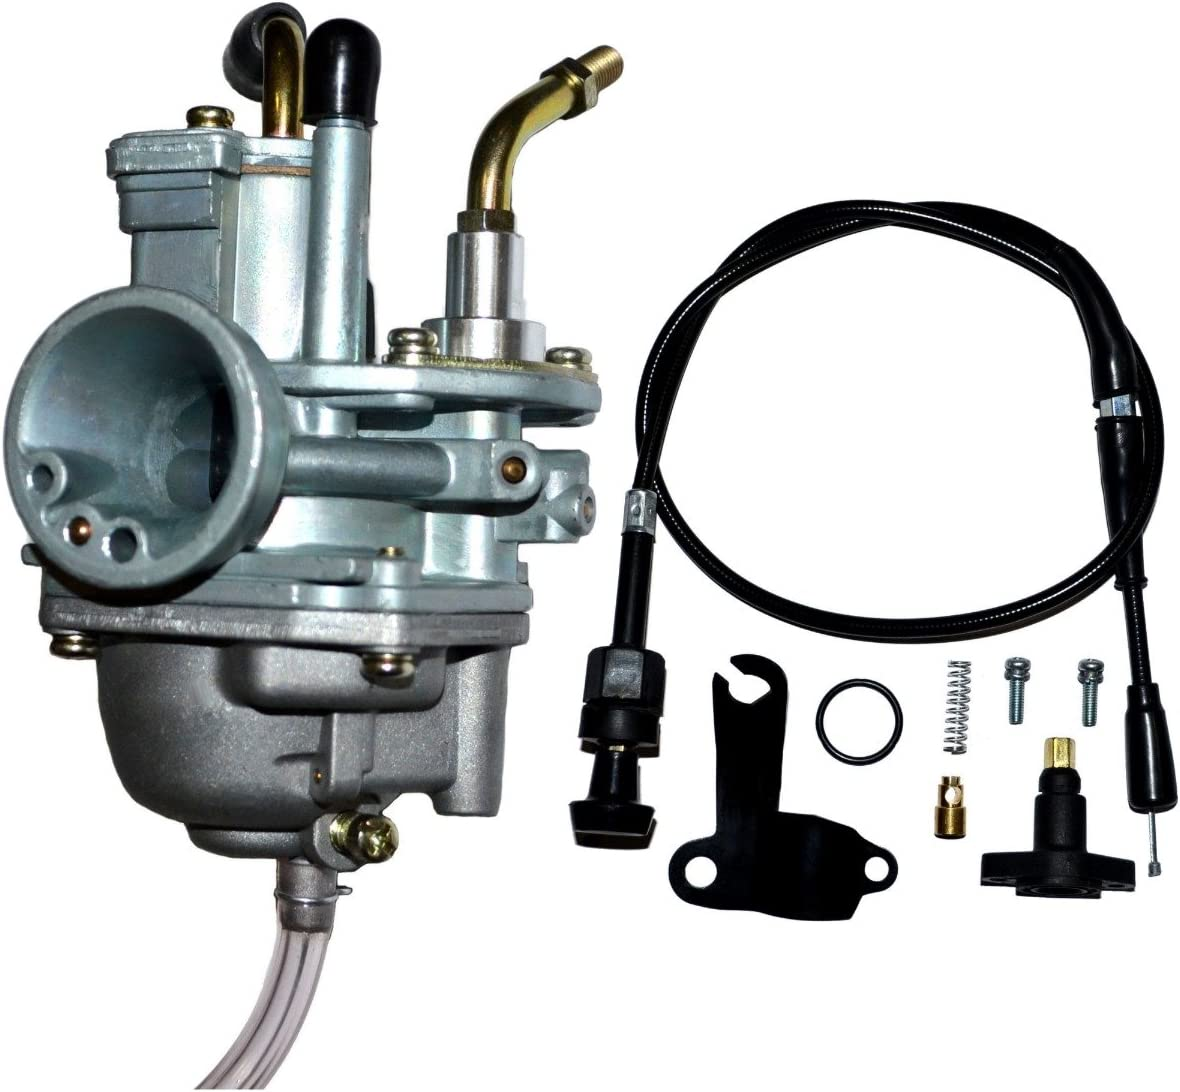 Carburetor for POLARIS SCRAMBLER 50 2001 2002 2003